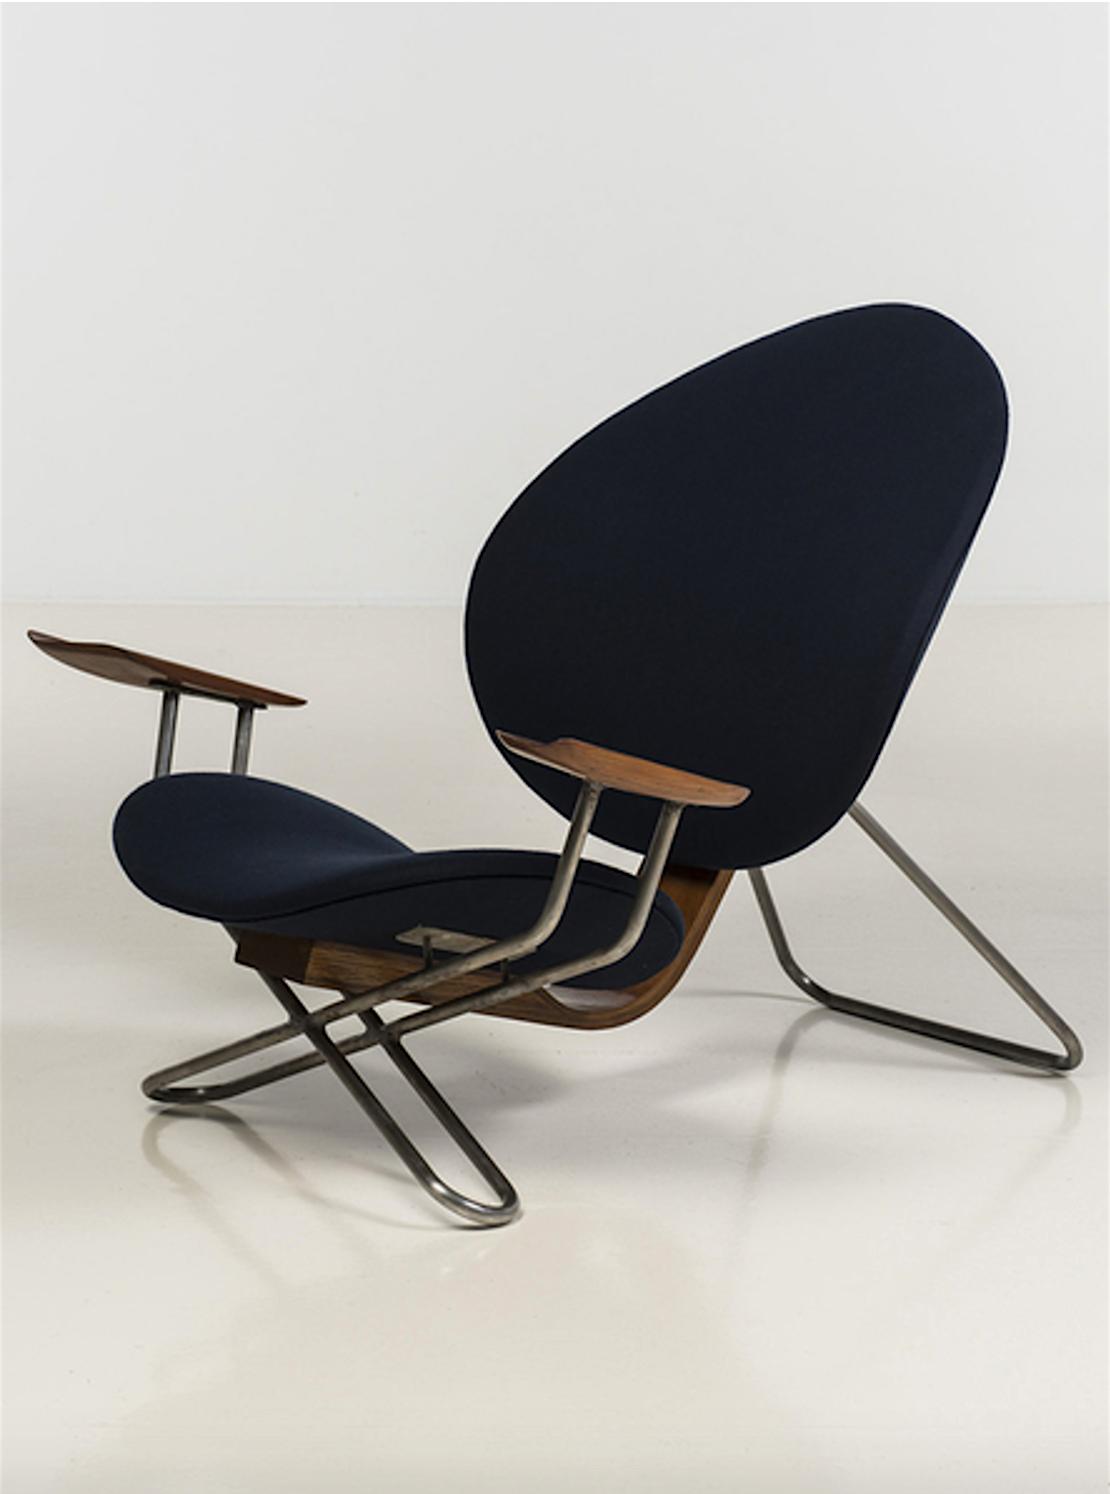 Erik magnussen attribu fauteuil 1960 piasa auctions - Modernes mobeldesign ...